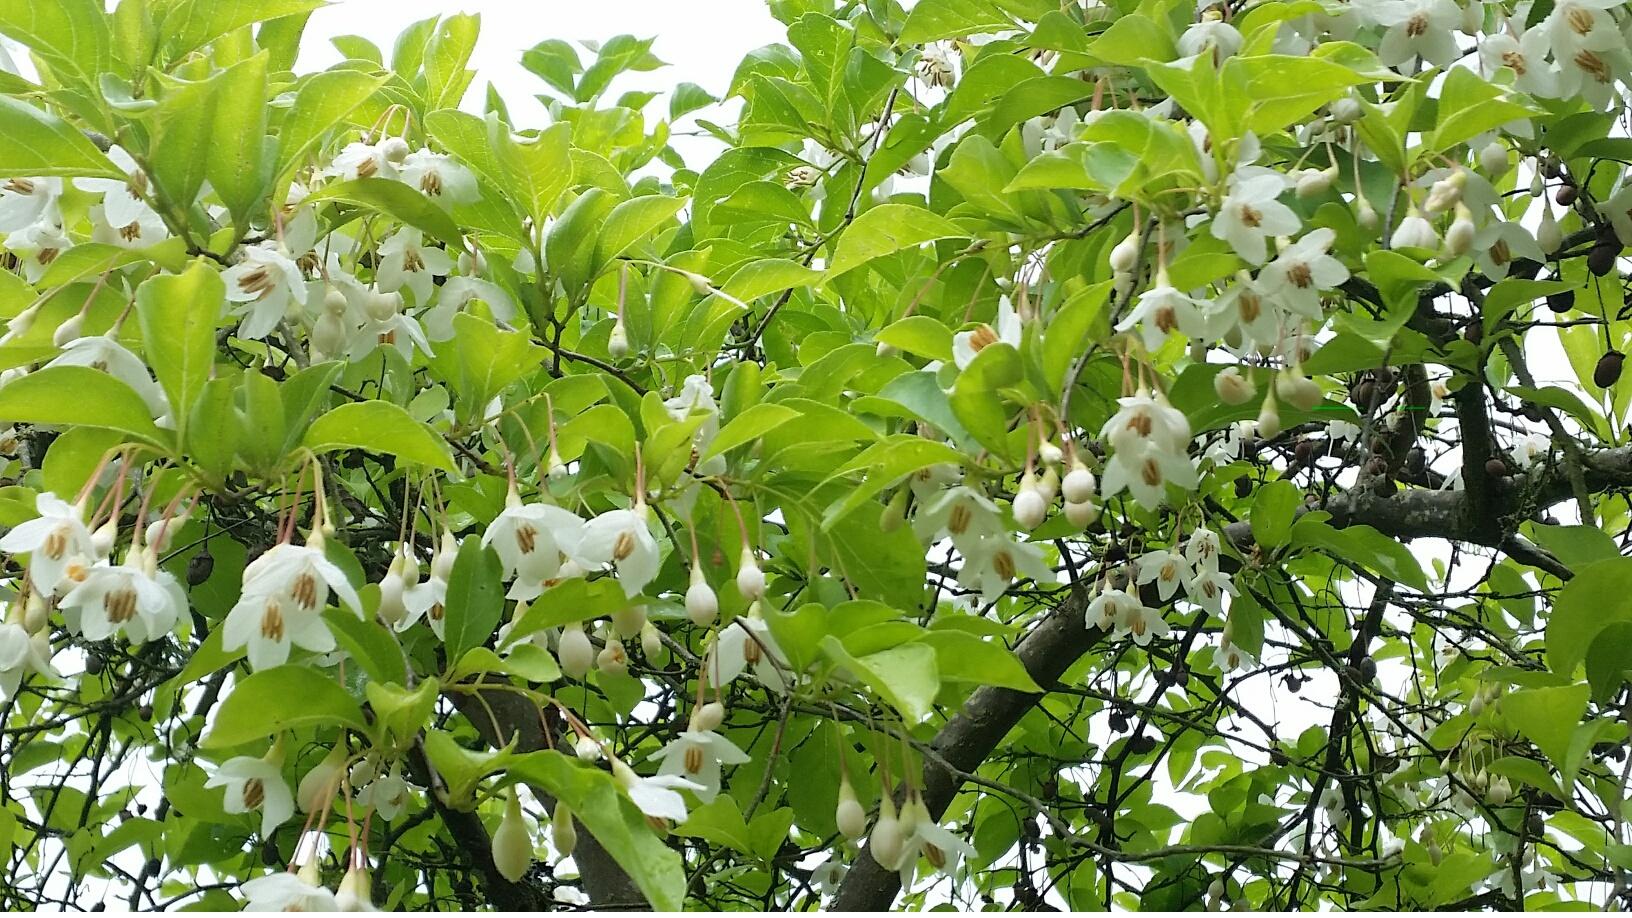 Styrax j.  'Carillon' flowers